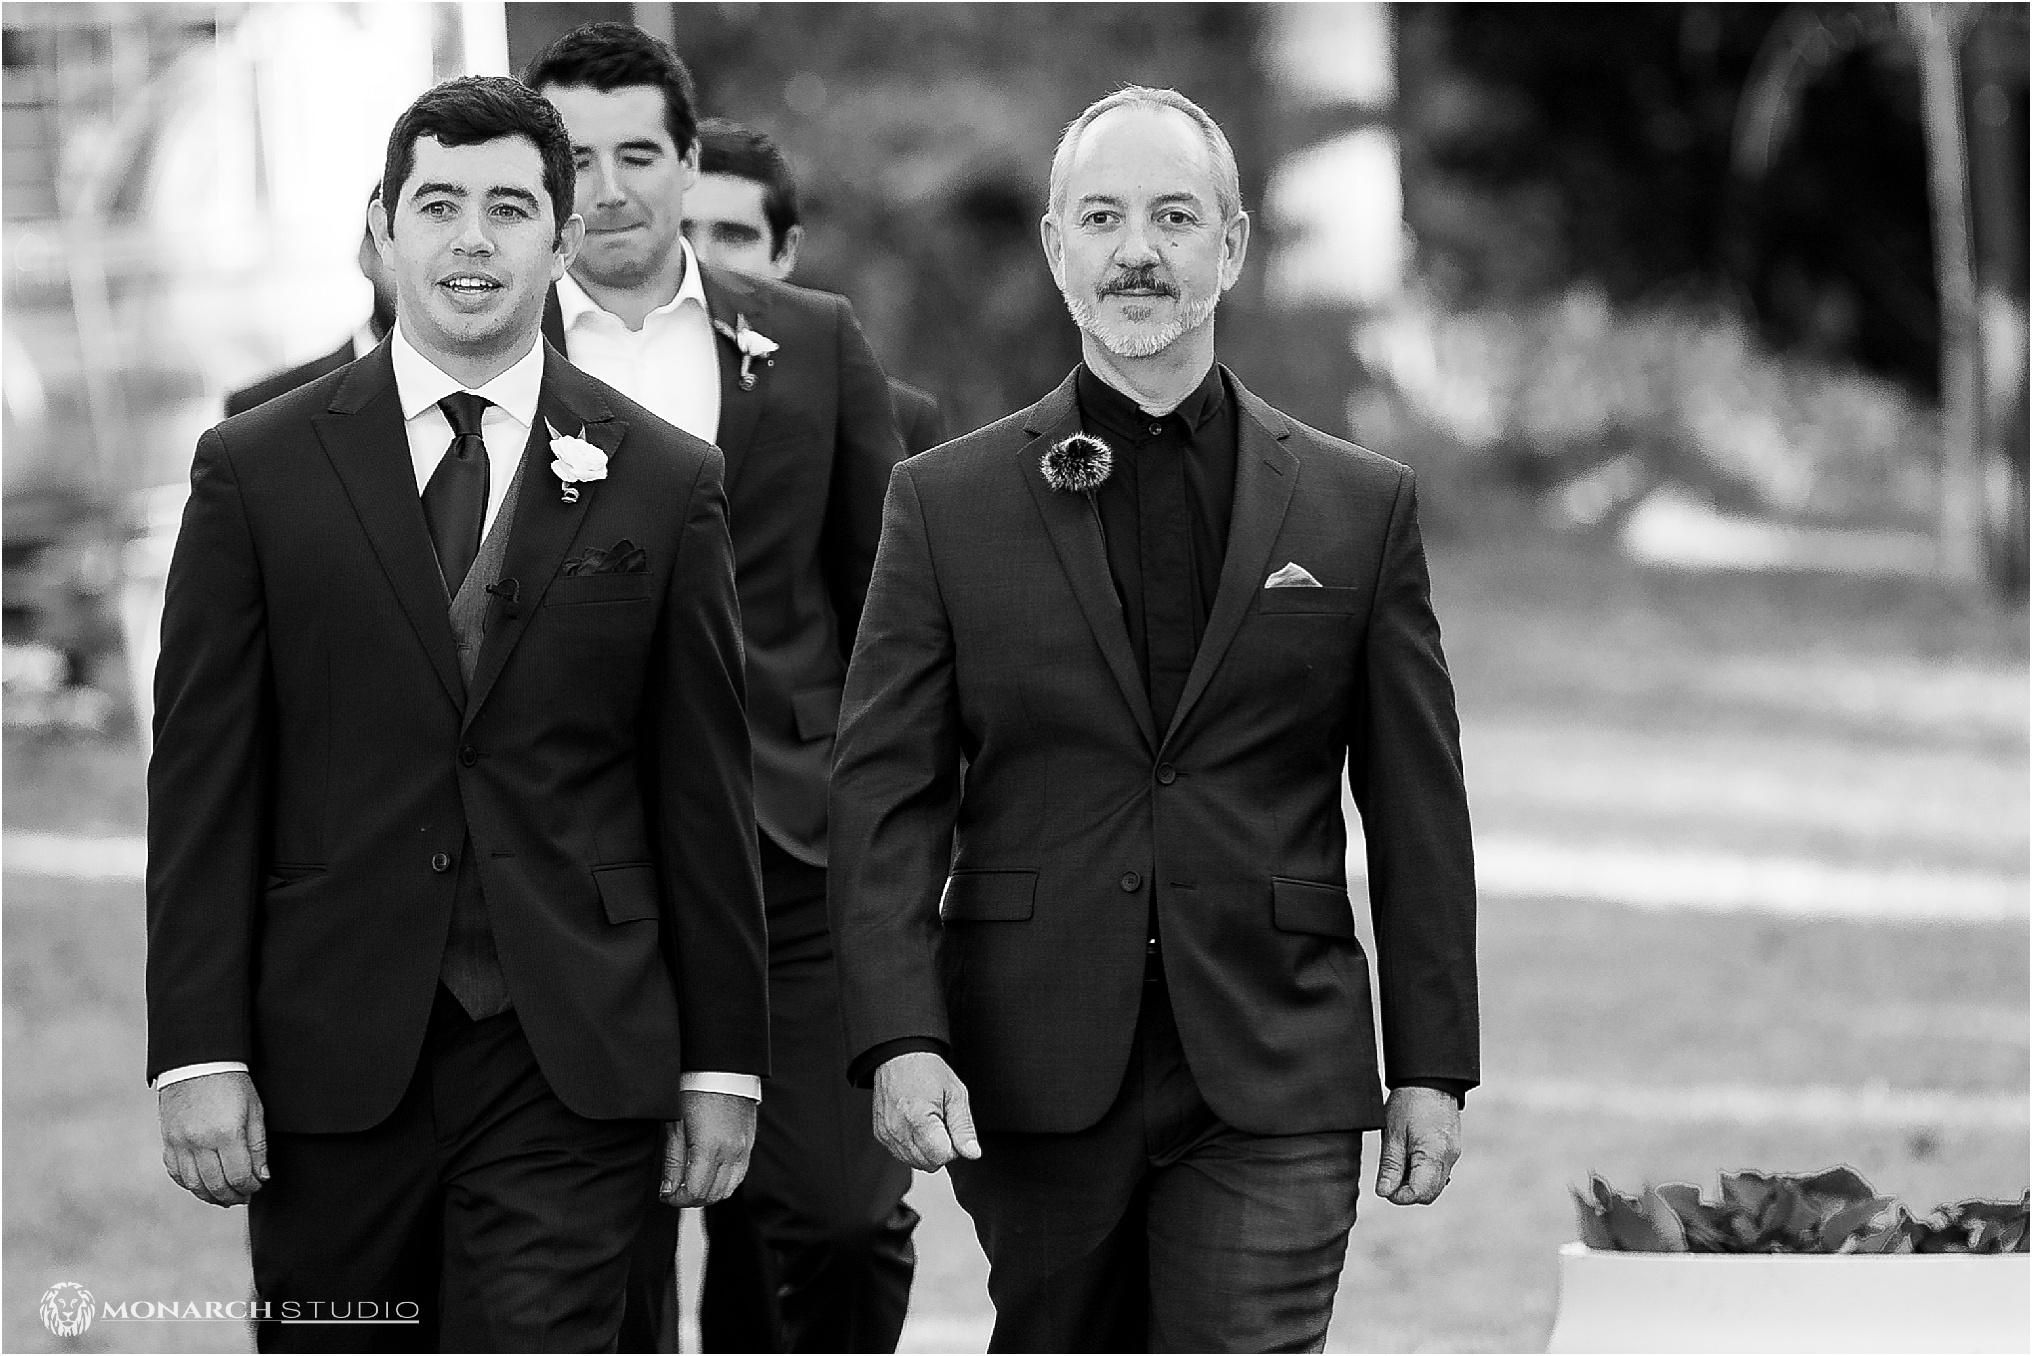 Wedding-photographer-in-sanford-florida-natural-wedding-033.jpg